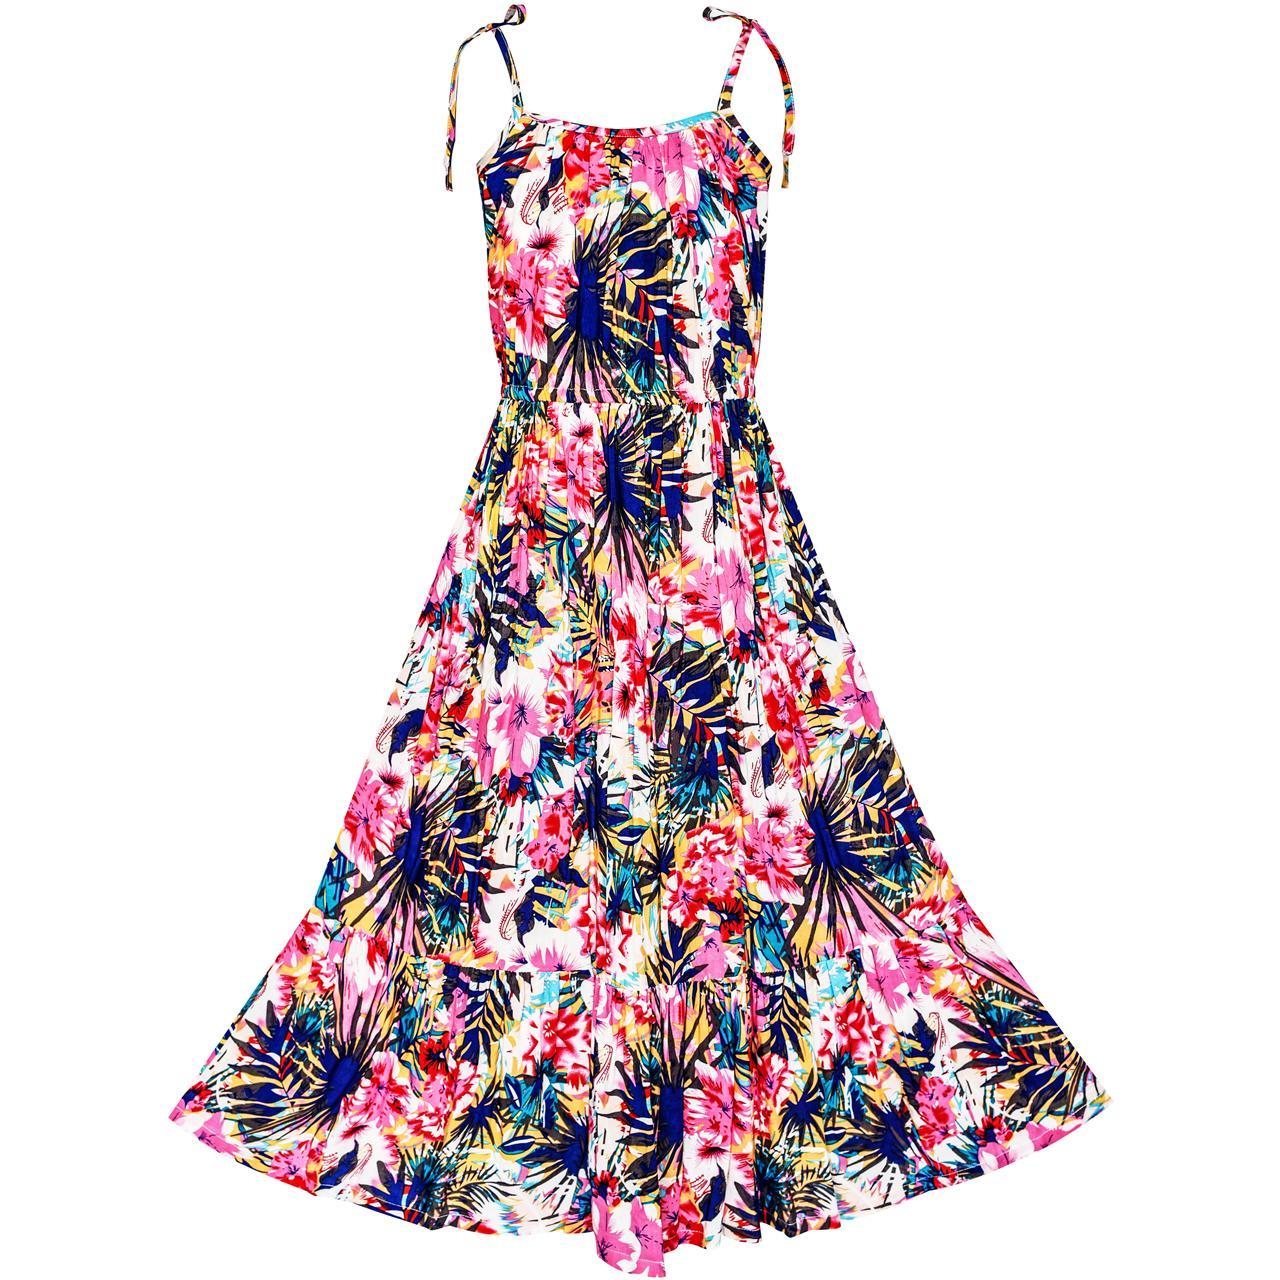 Sunny Fashion Flower Girl Dress Tropical Leaf Skater Ruffle Sundress Cotton 2017 Summer Princess Wedding Party Size 7-14 tropical flower женские заколки цветы